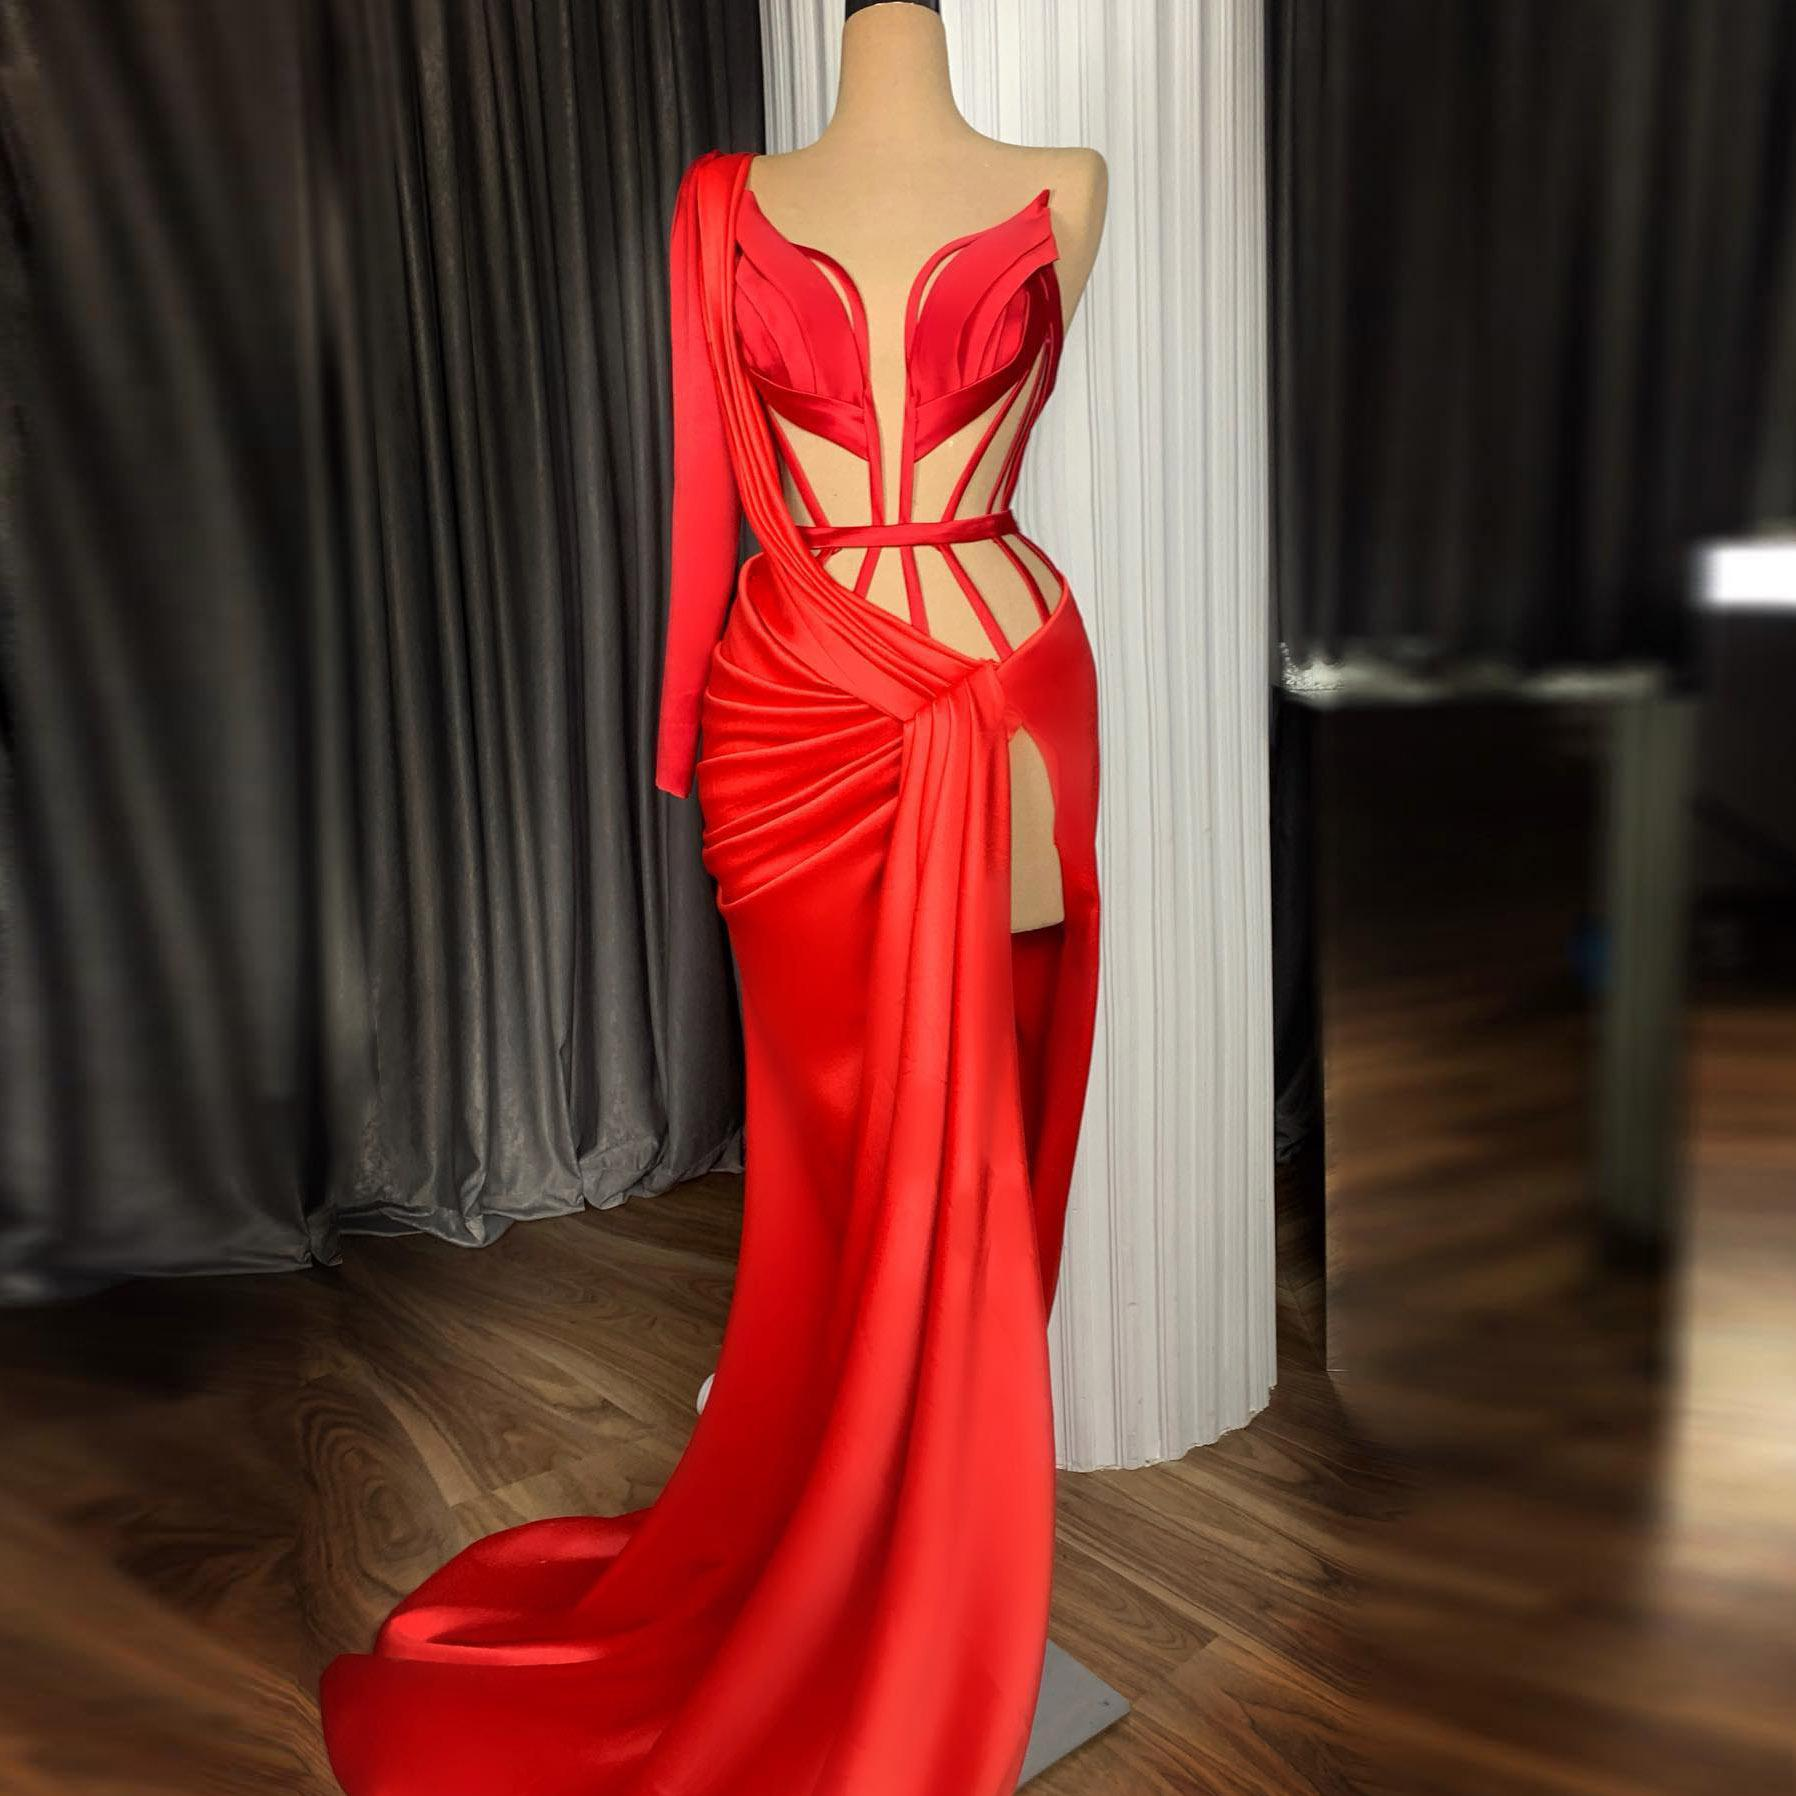 Sexy Vermelho Ilusão Alta Lateral Split Longo Prom Vestidos Um Ombro Cetim Tapete Vermelho Vestidos De Prom Vestidos Formal Vestidos De Noite Abendkleider